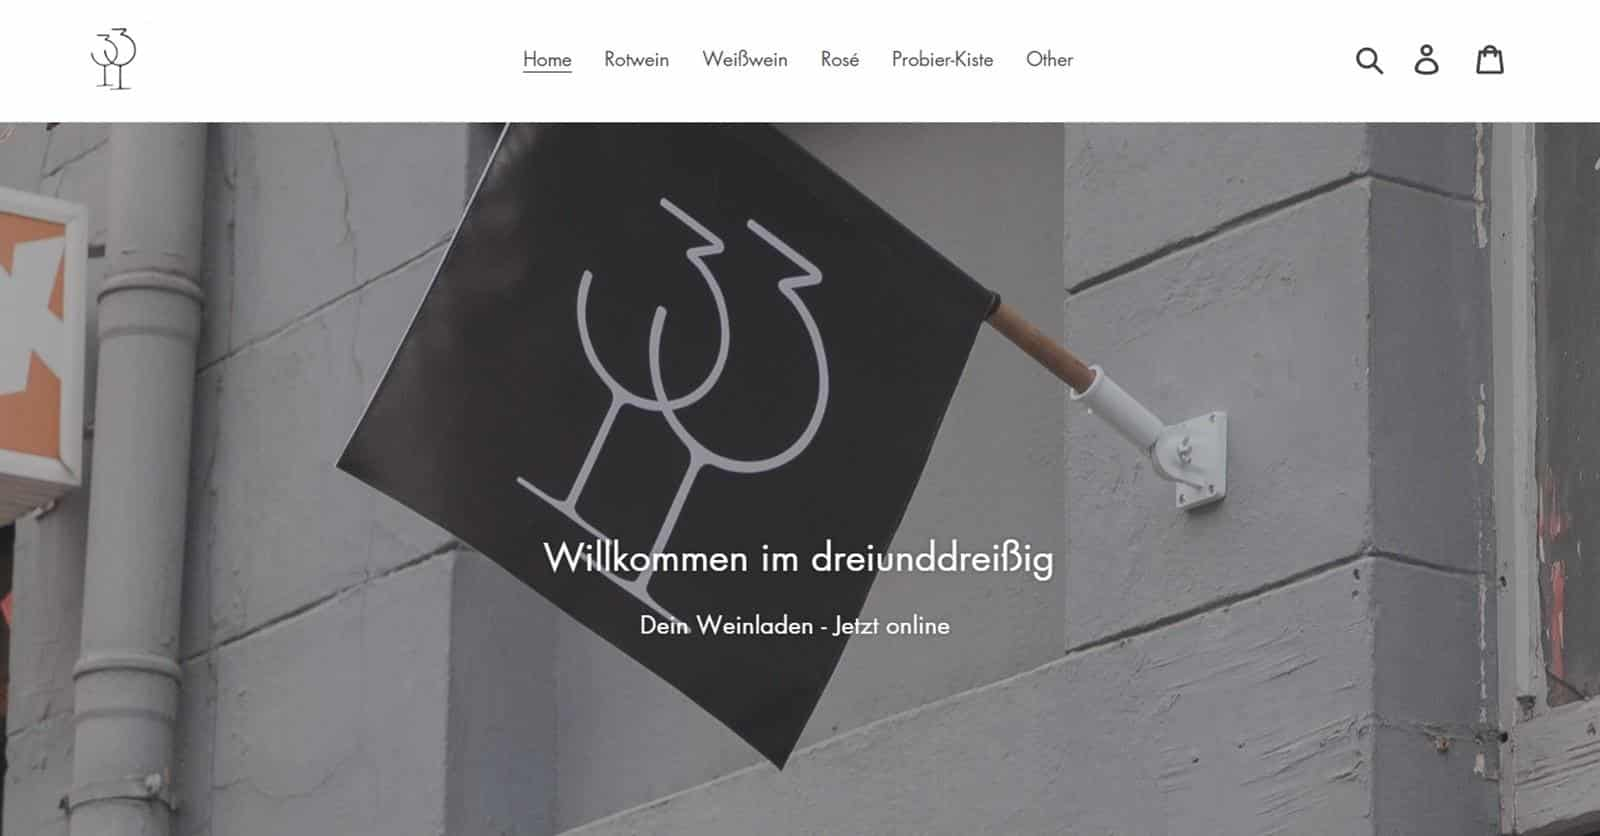 Style Hannover dreiunddreissig Online Shop FB - Support your locals